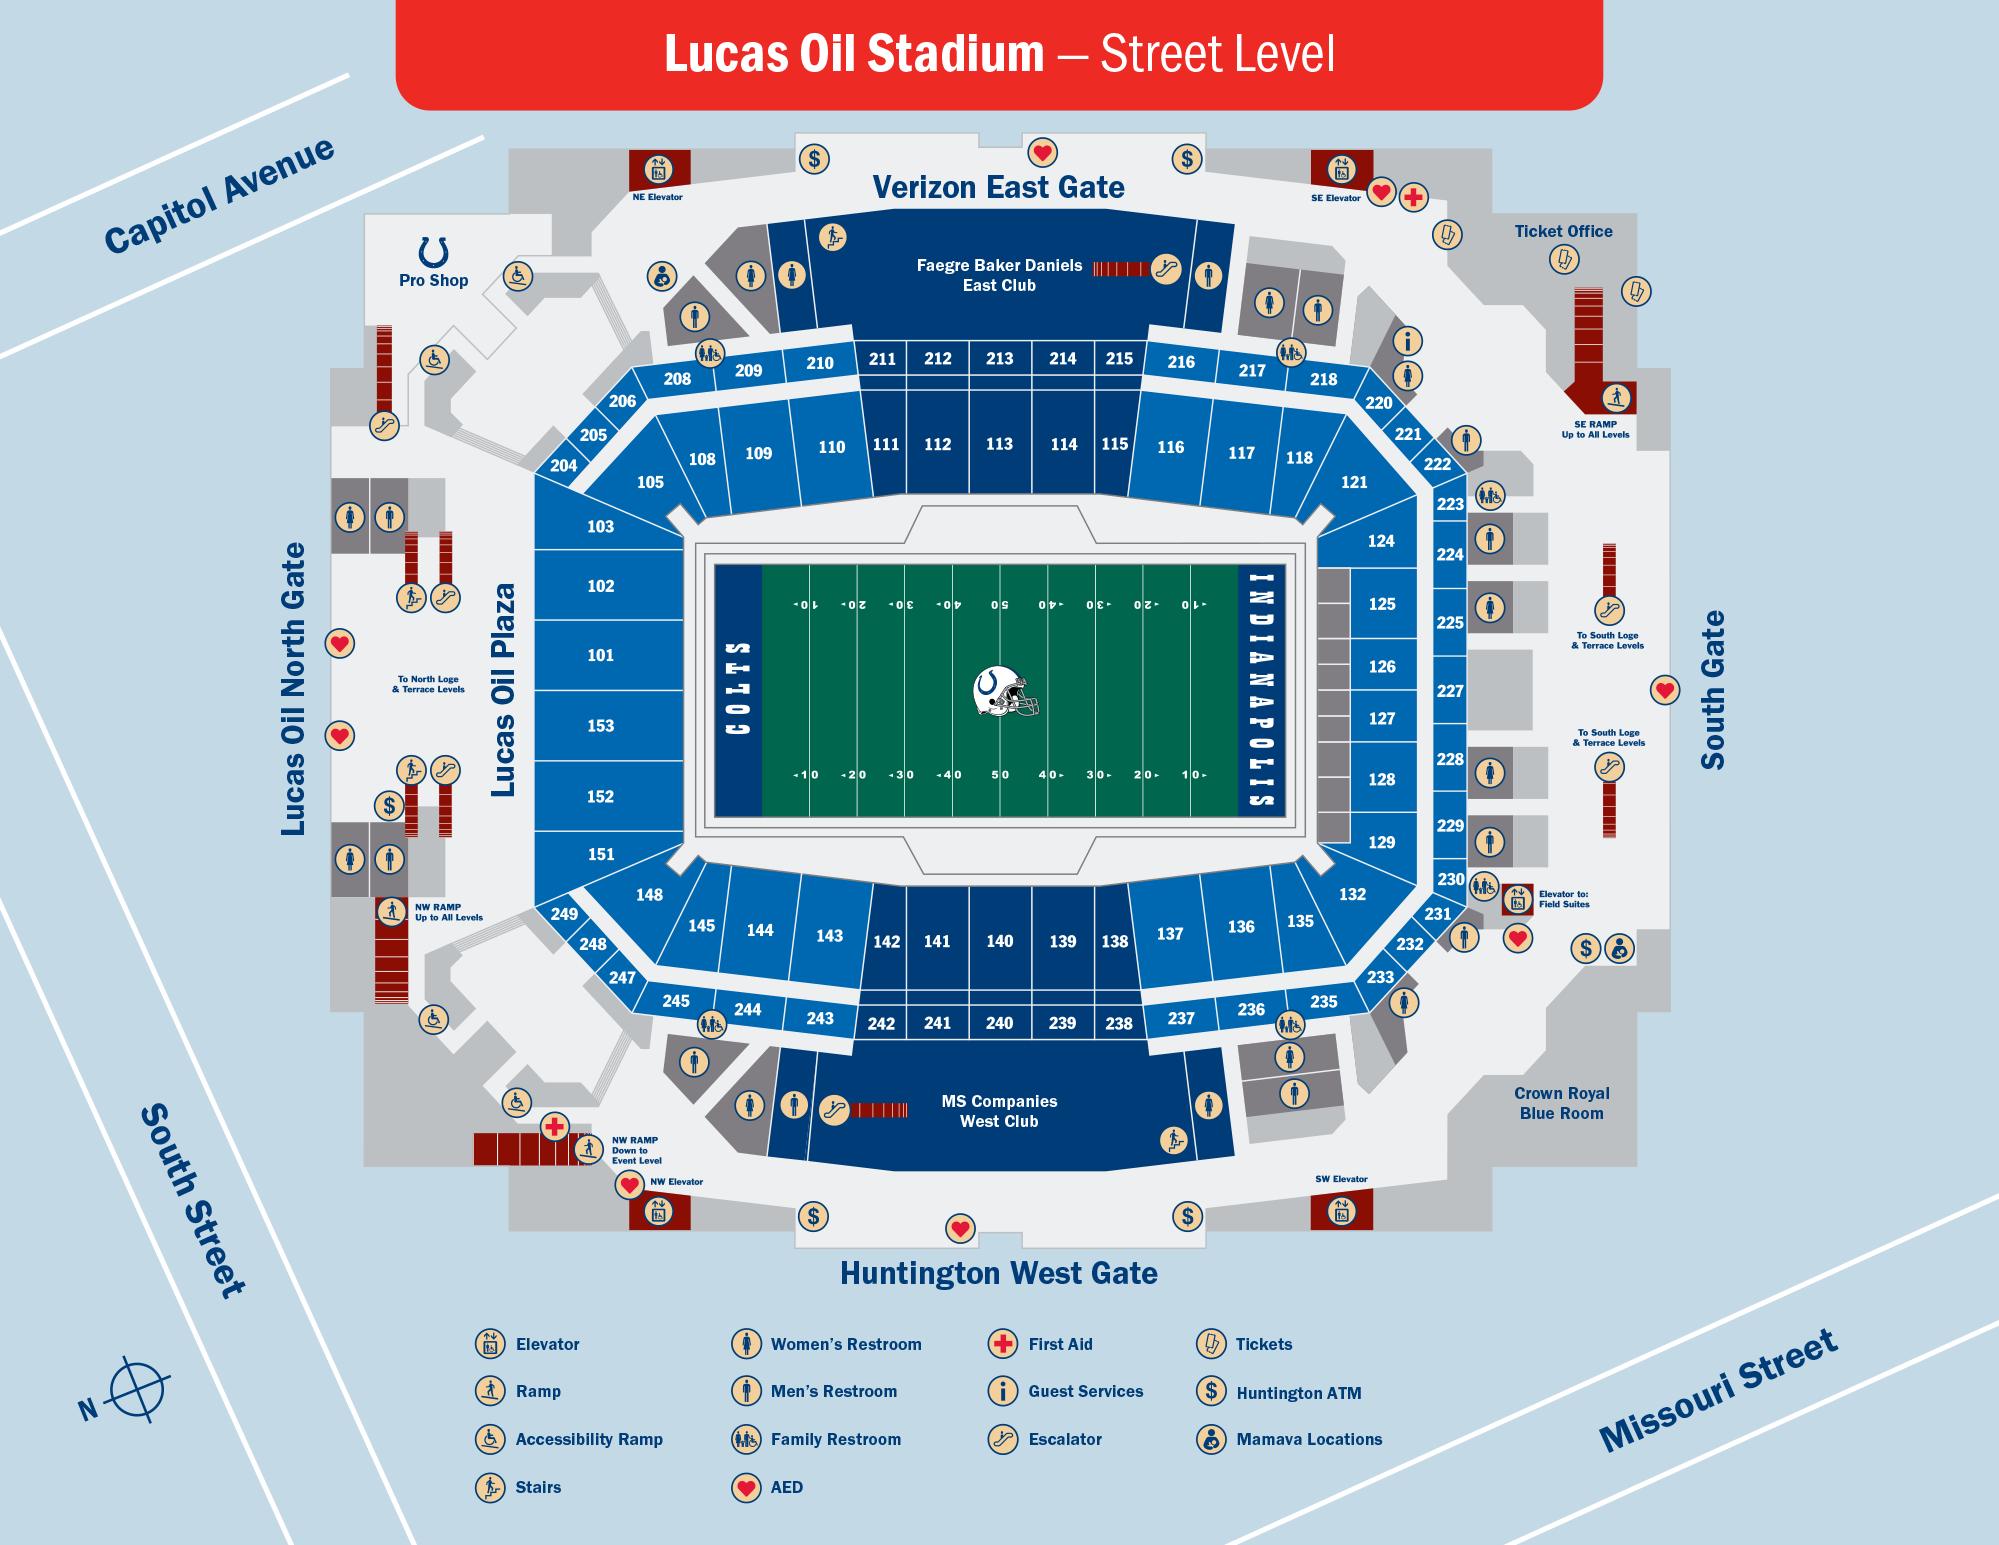 Lucas Oil Stadium Street Level Map